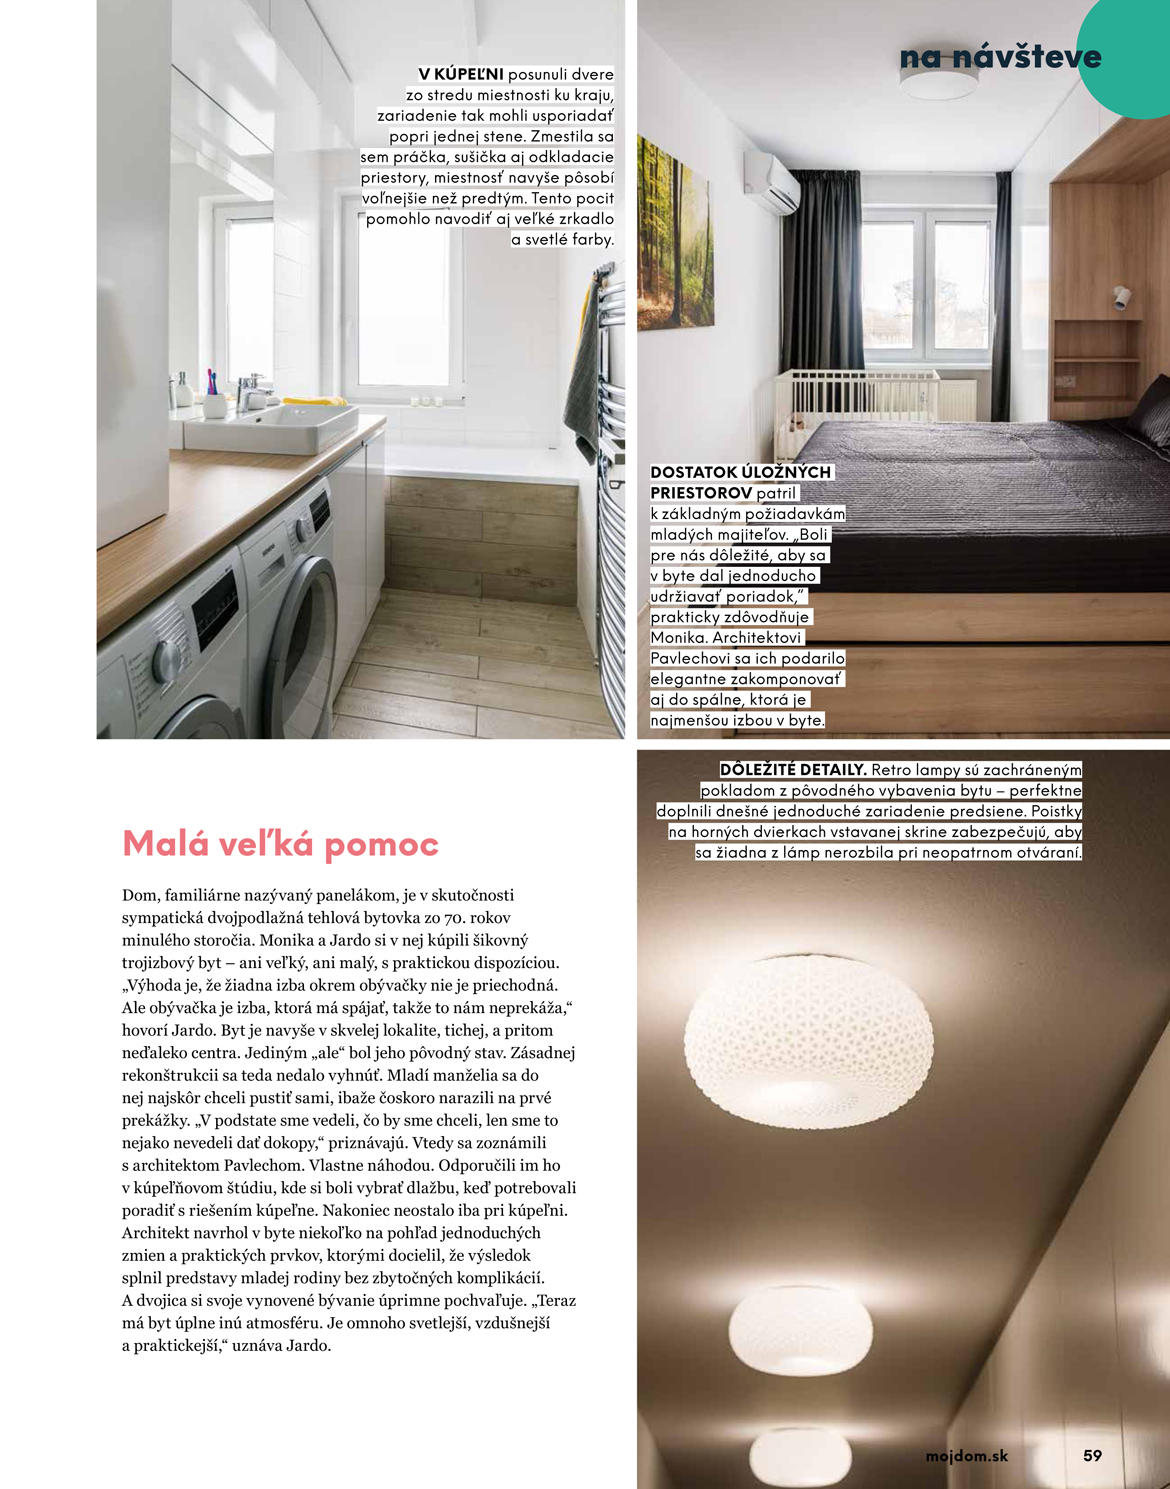 004-byt-cachtice-rekonstrukcia-interier-mojdom-pavlech-architekti